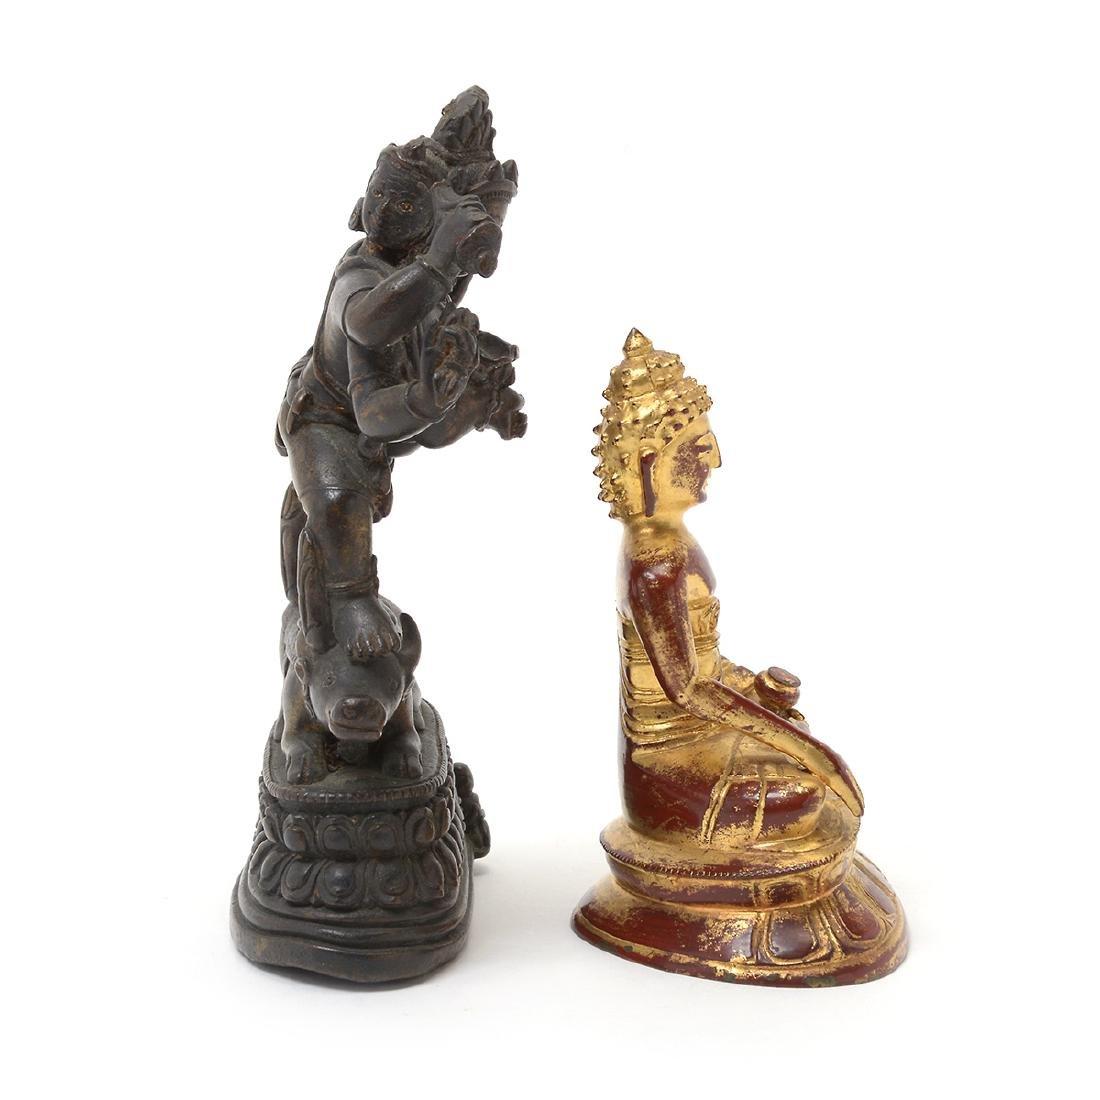 Two Bronze Buddhist Figures, 17th/18th Century - 5